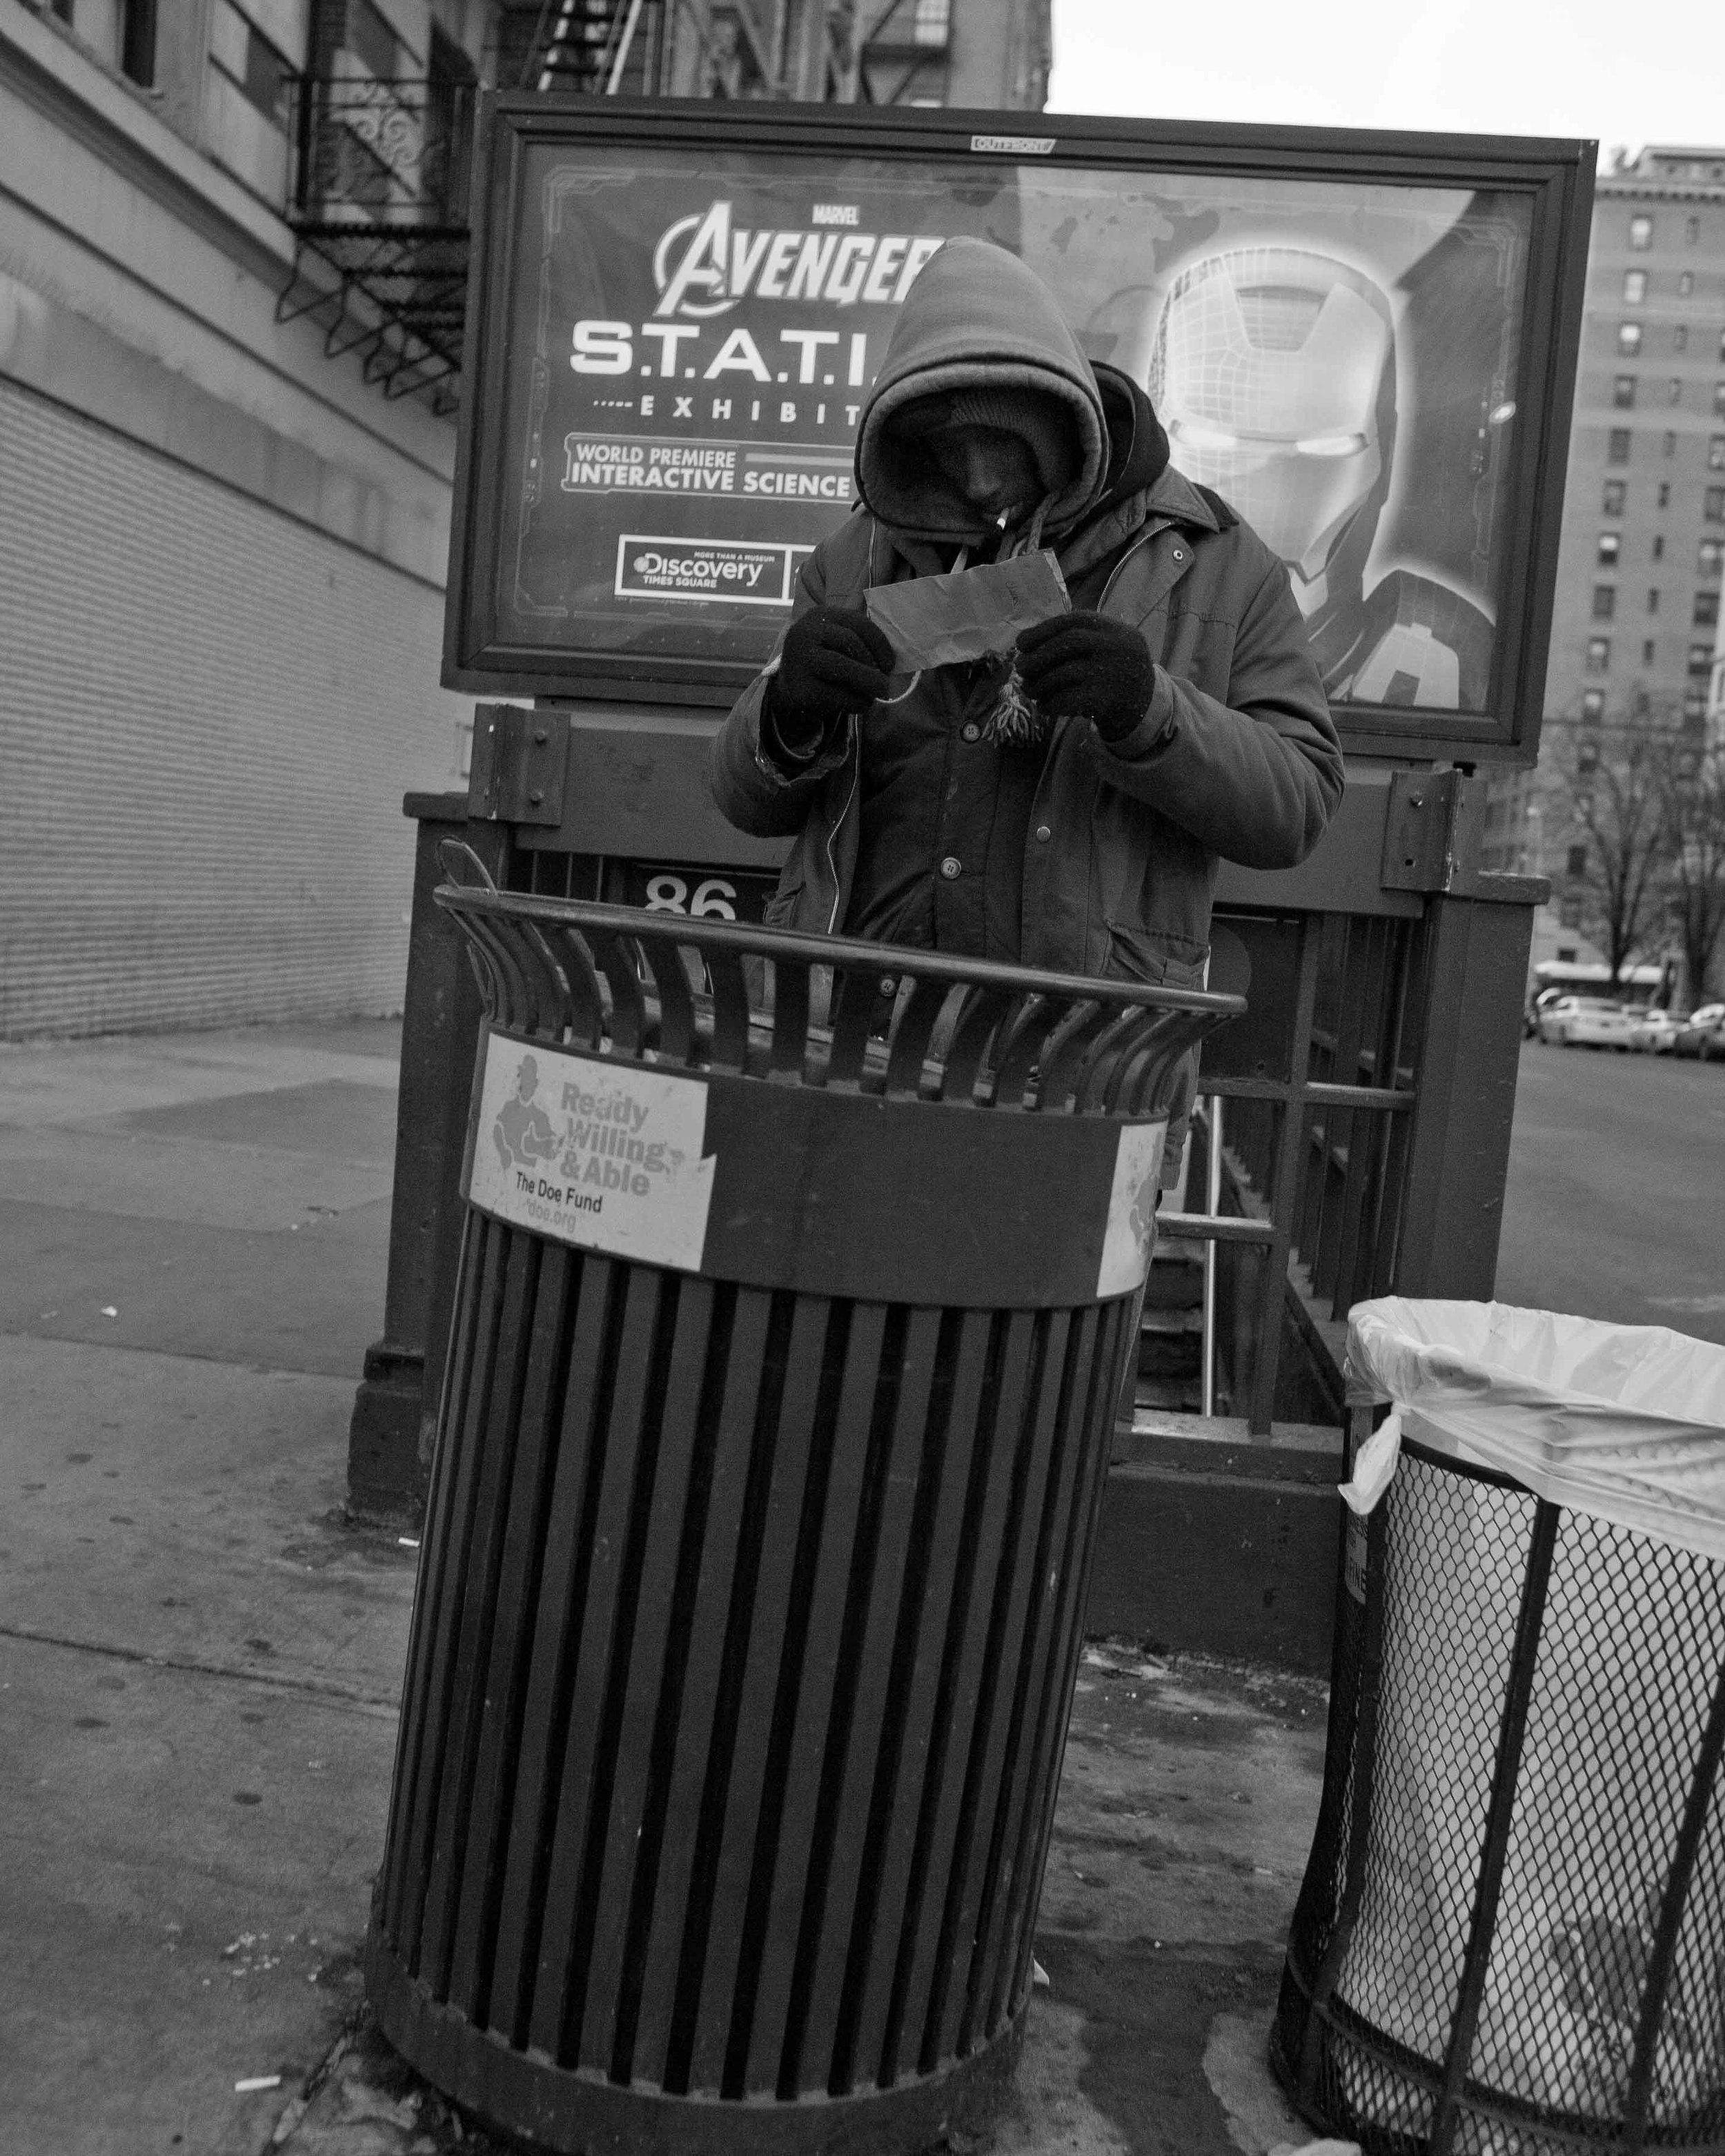 Streetphotography 3.0-63.jpg